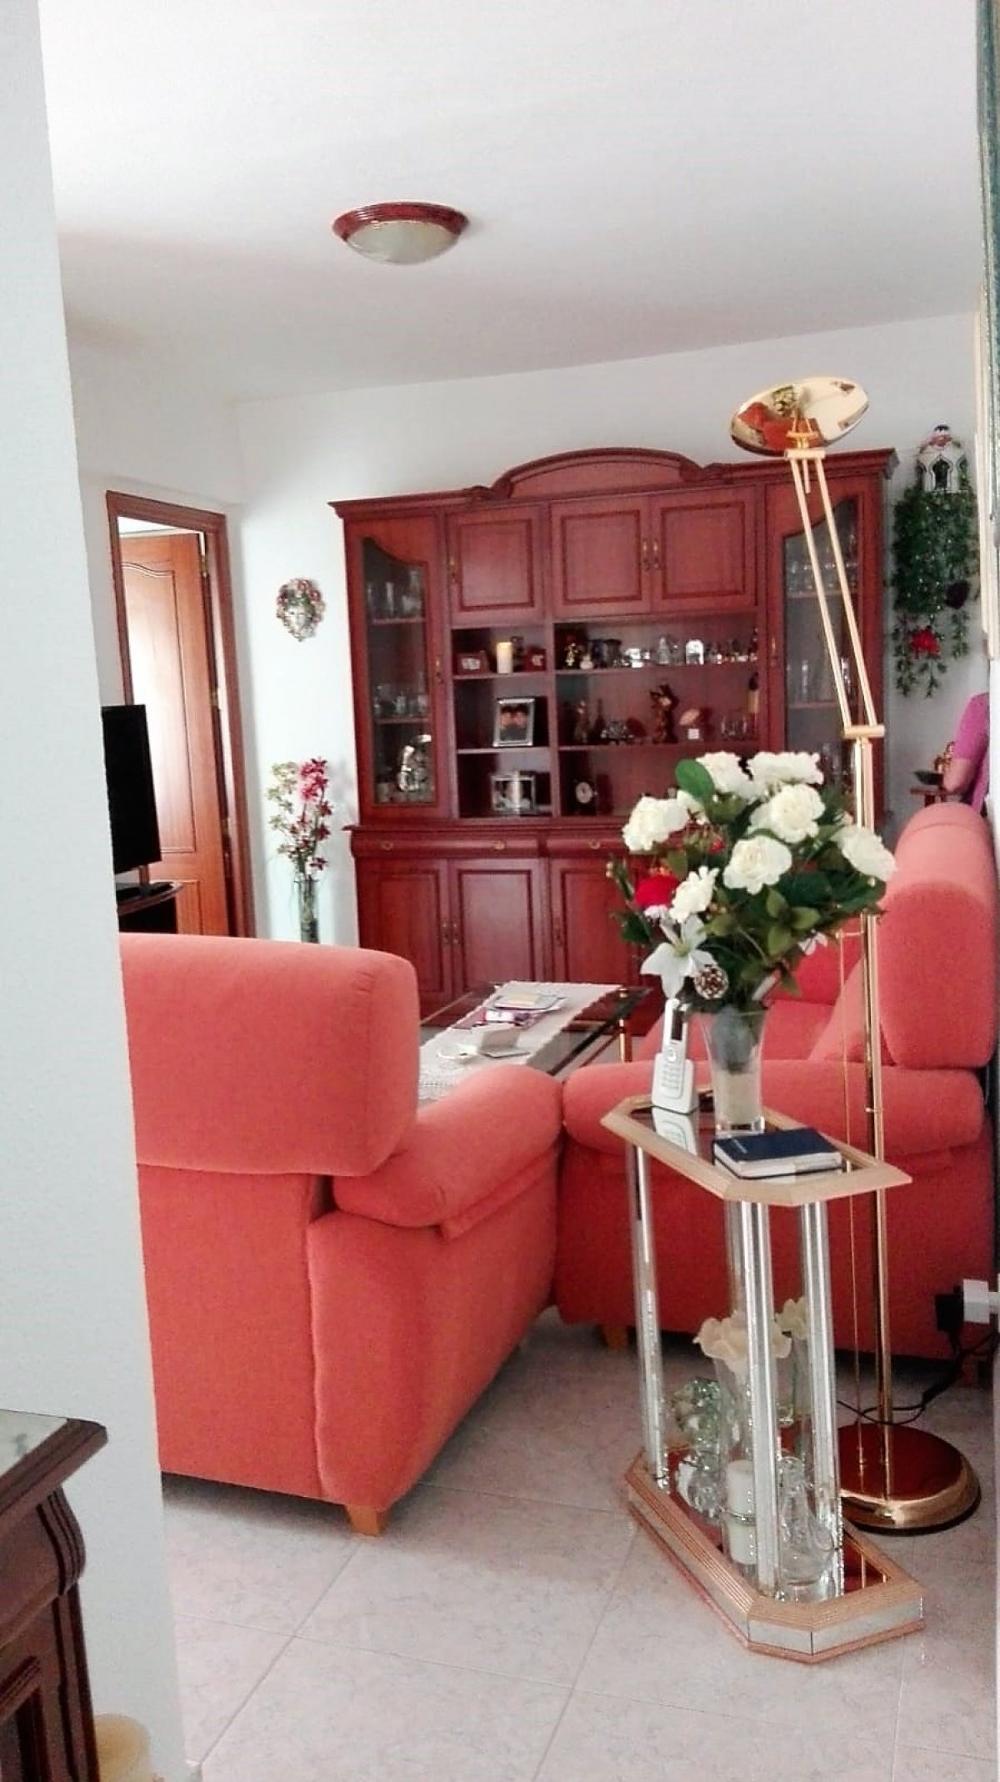 levante córdoba lägenhet foto 3839285